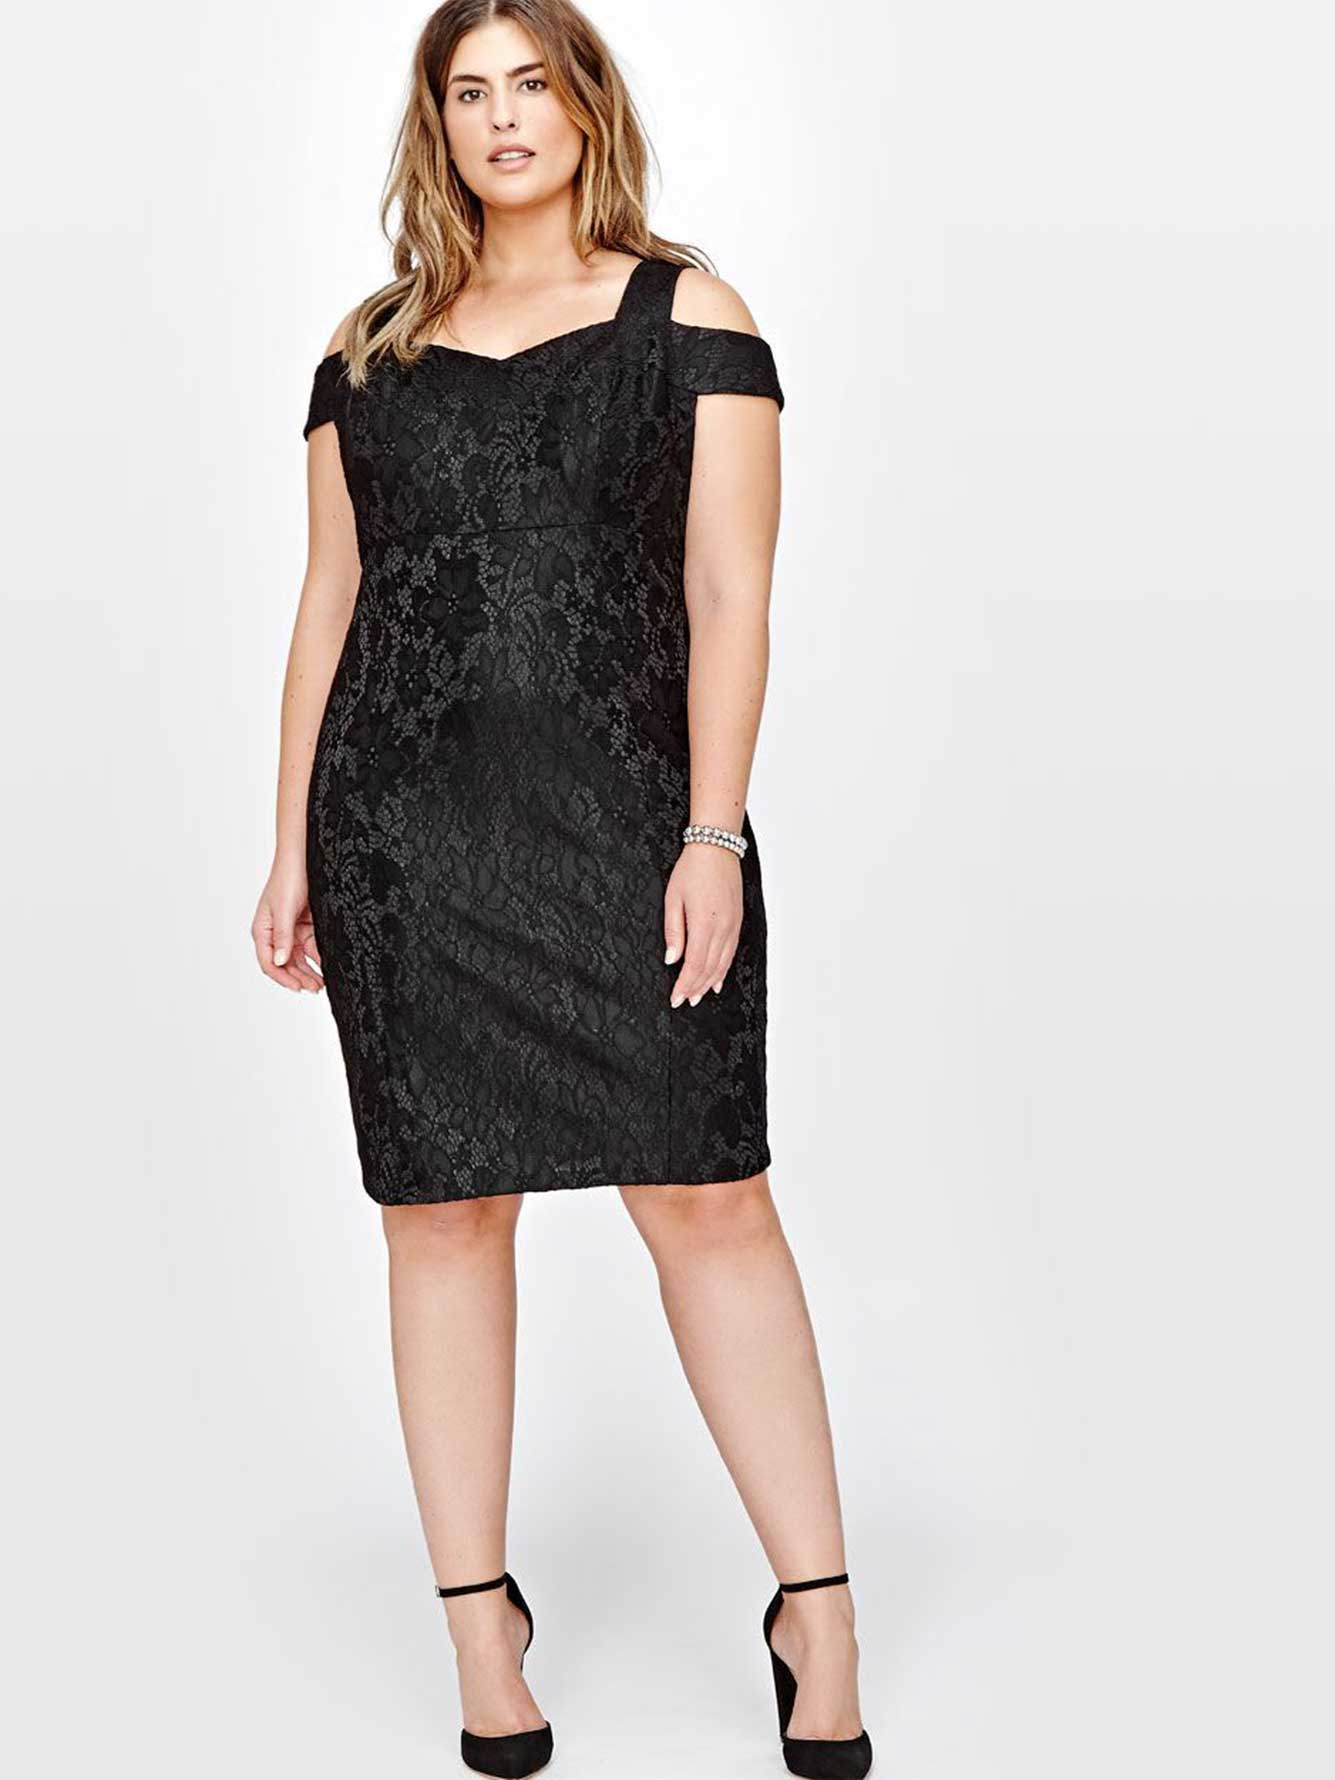 5183ad988b1739 Sangria Cold Shoulder Bodycon Dress